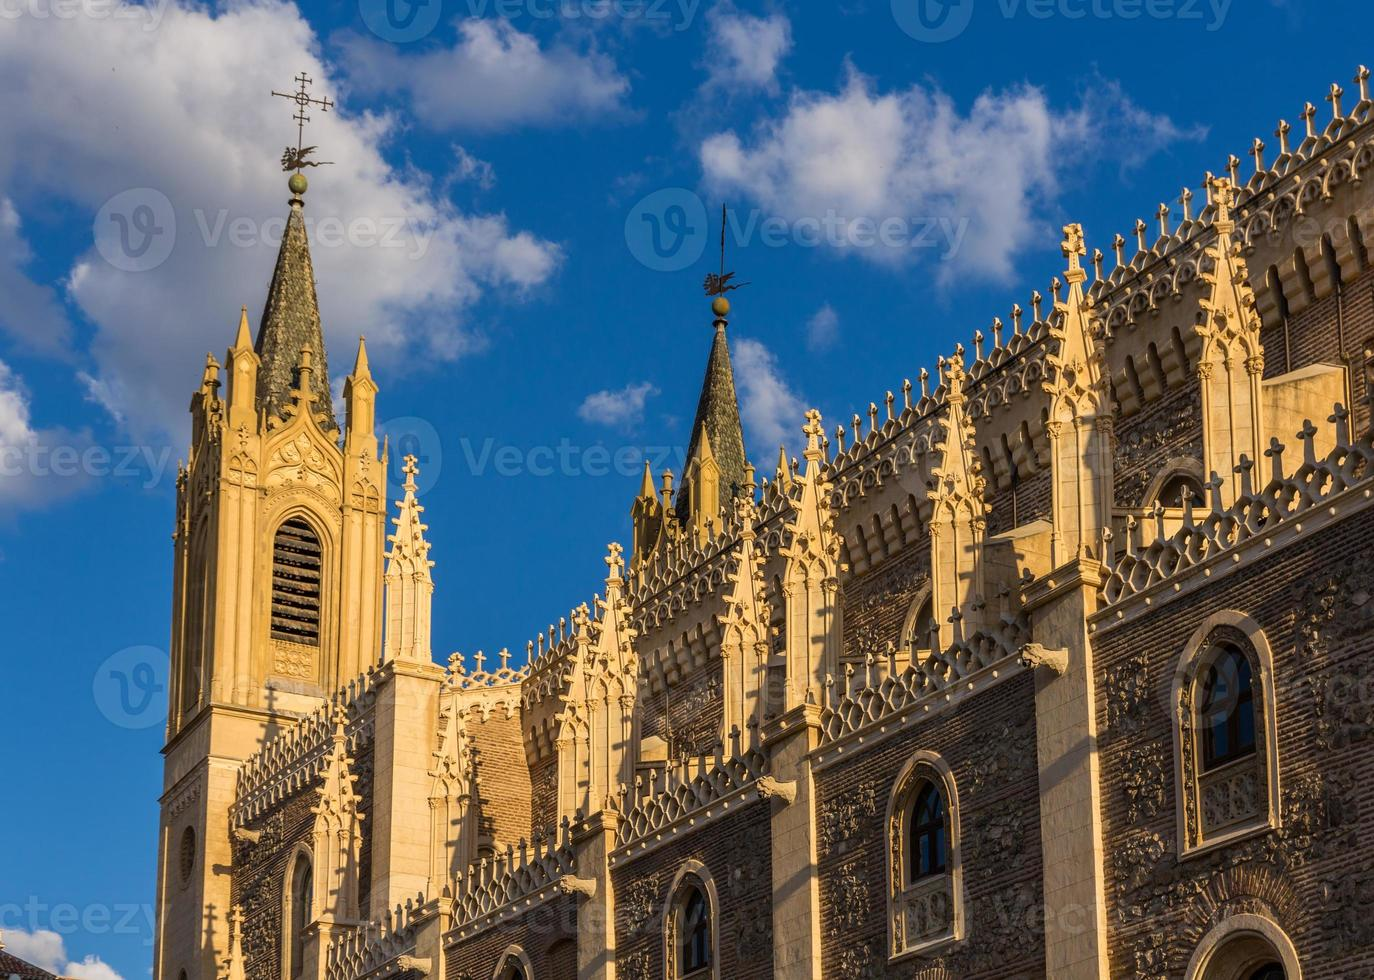 chiesa di san jeronimo el realo a madrid, spagna foto